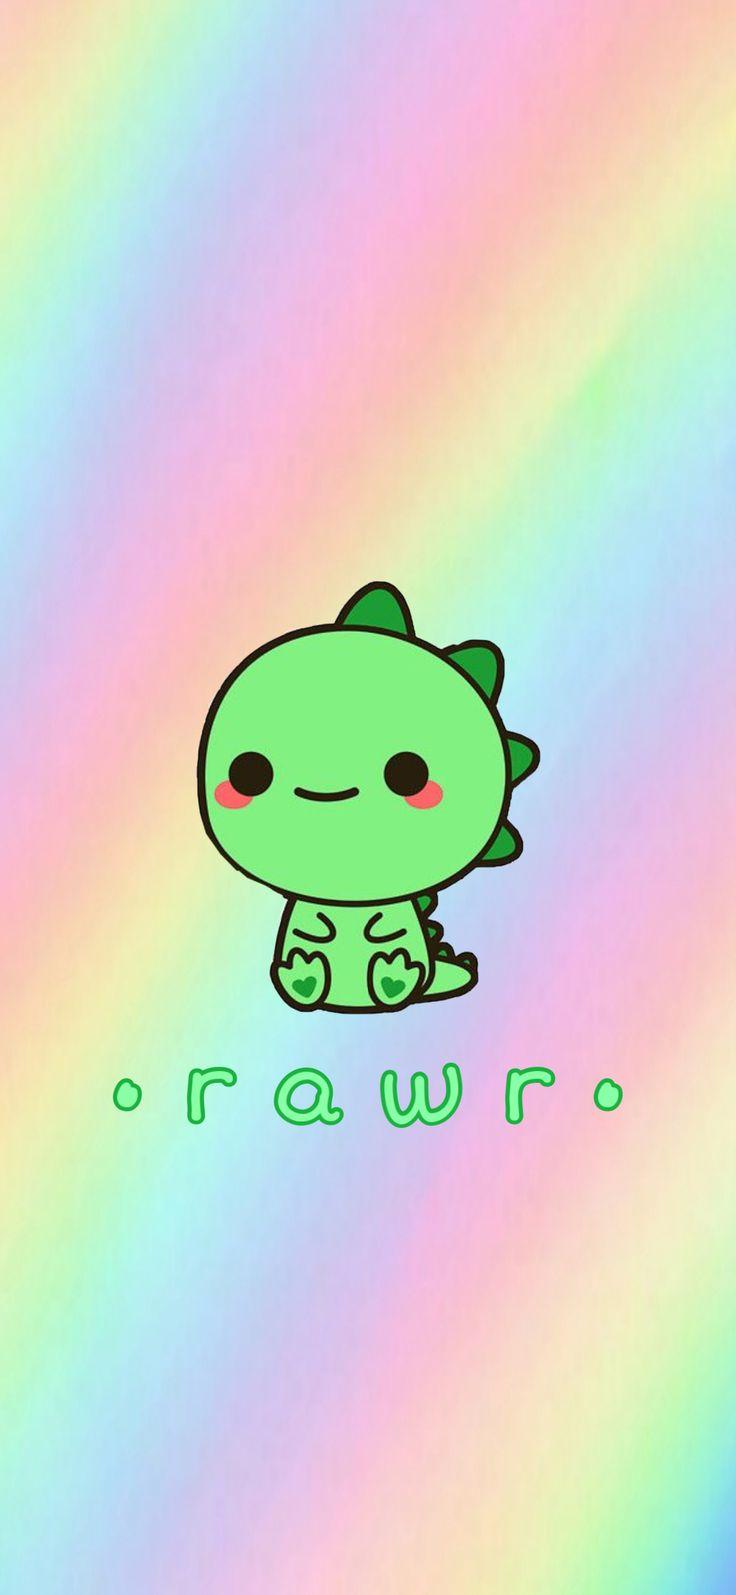 cute cut pro free download